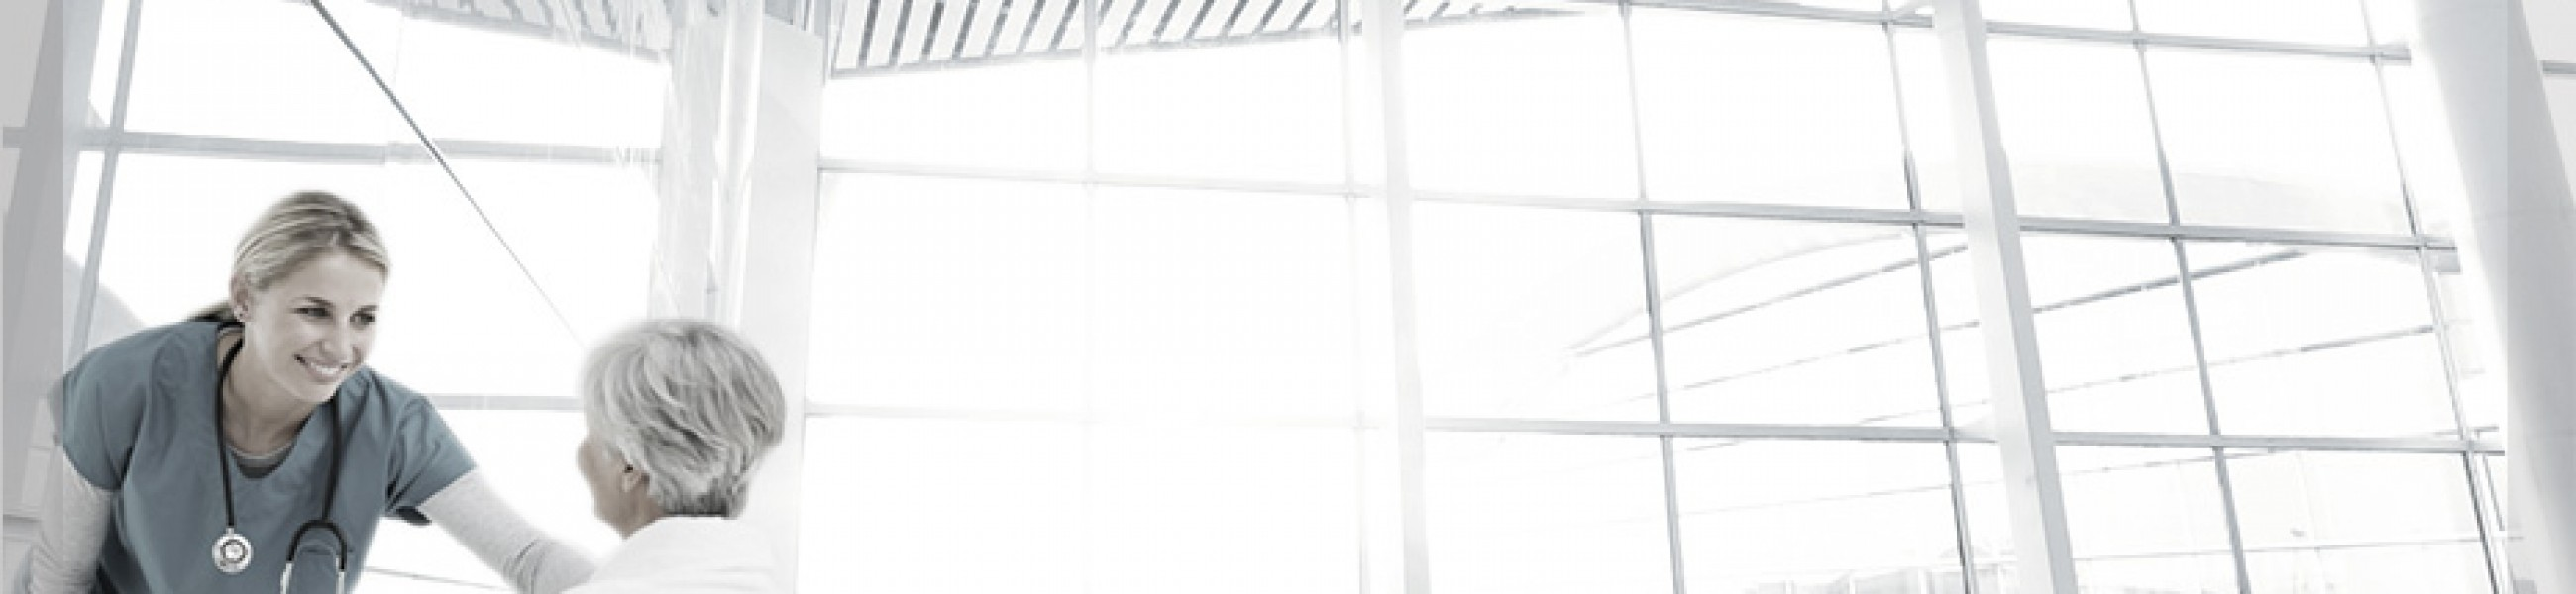 hospitals-2xrgon6e9u5fk2gp01n30g